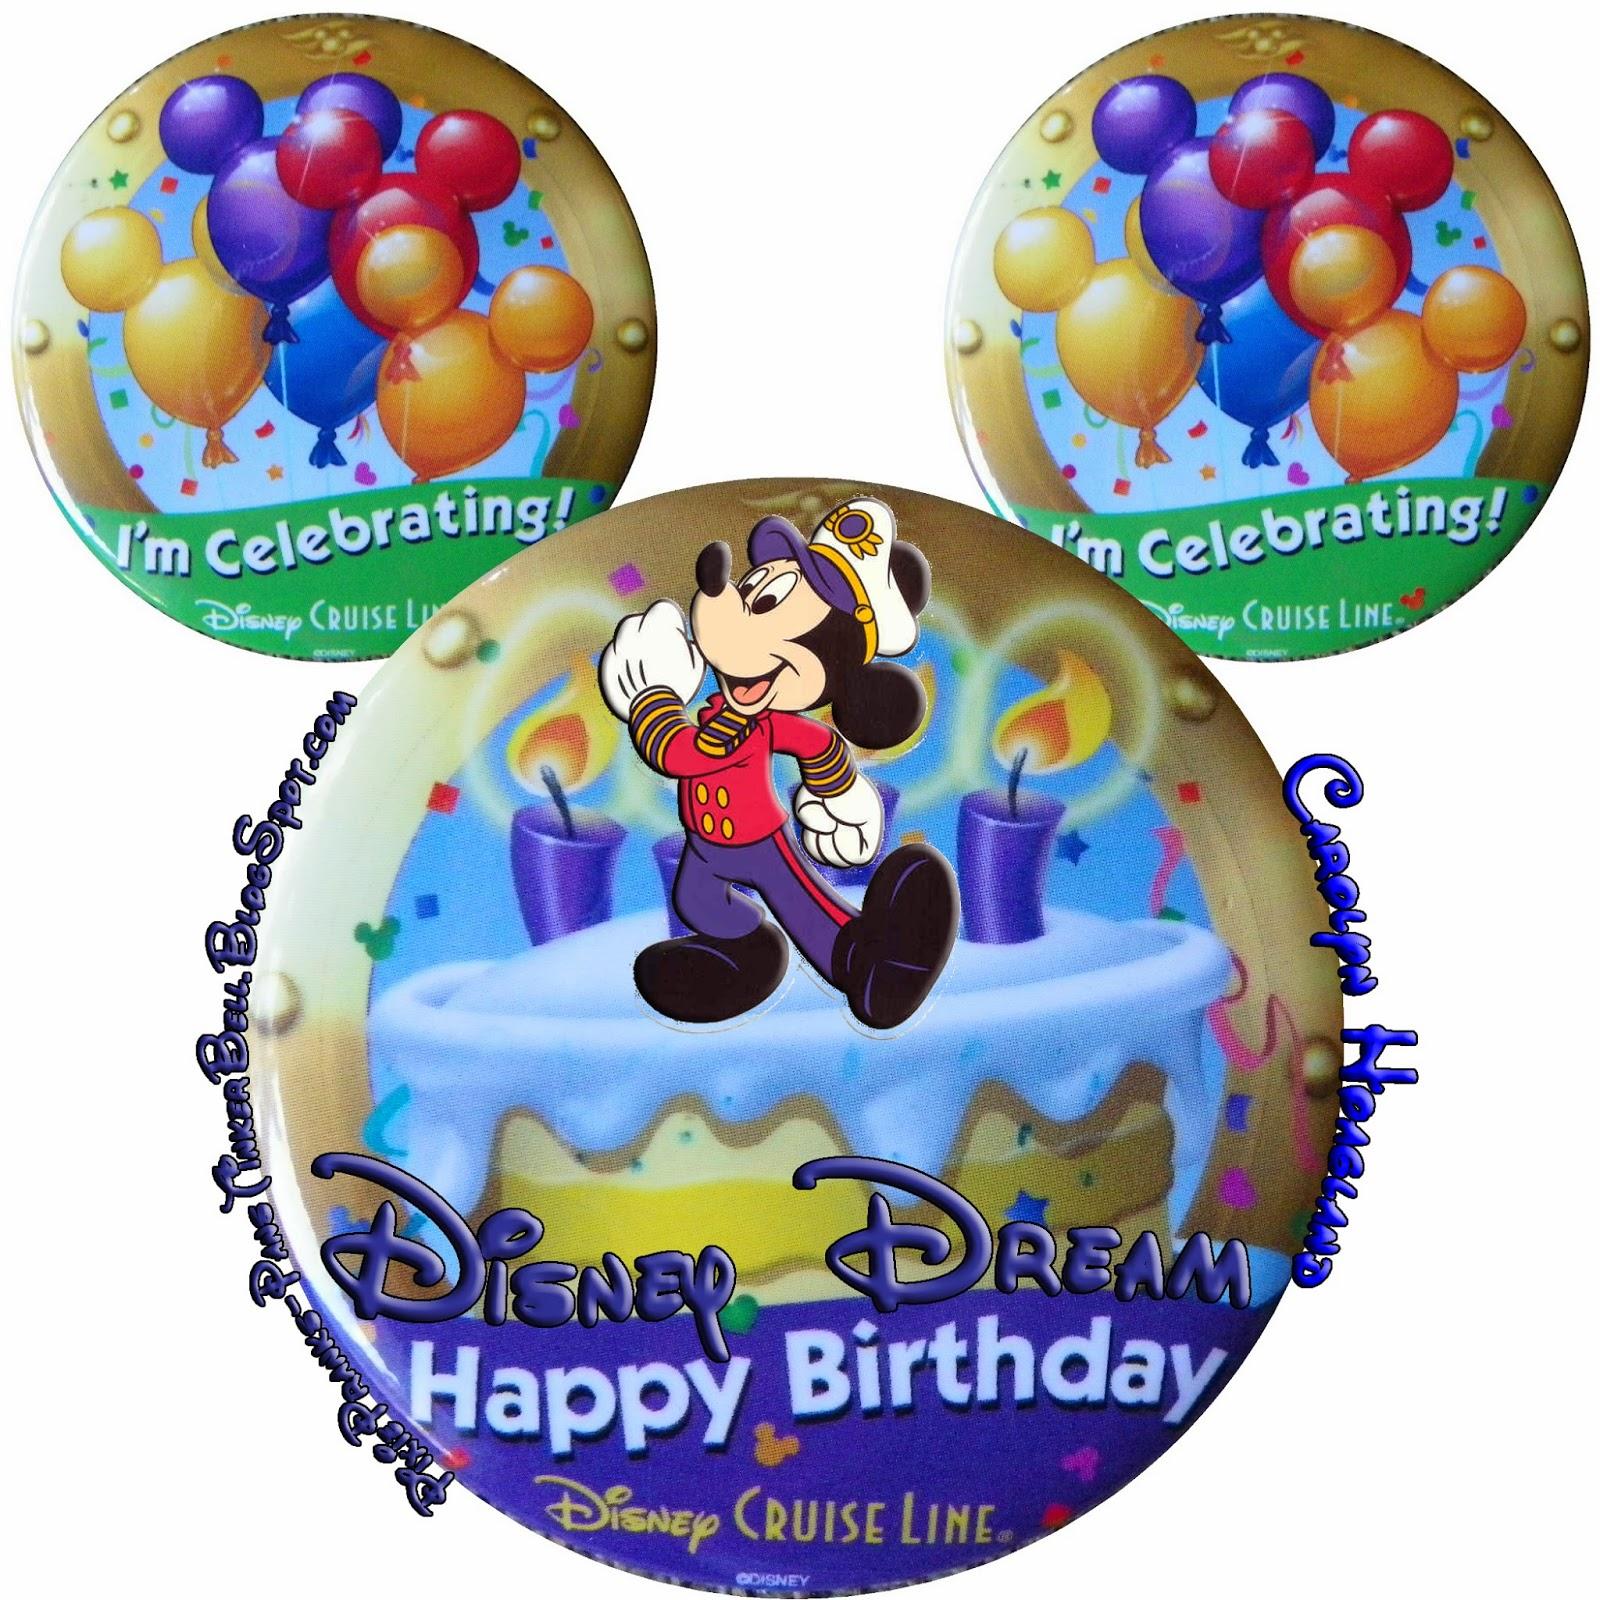 1600x1600 Pixie Pranks And Disney Fun Happy Birthday Disney Dream Cruise Ship!!